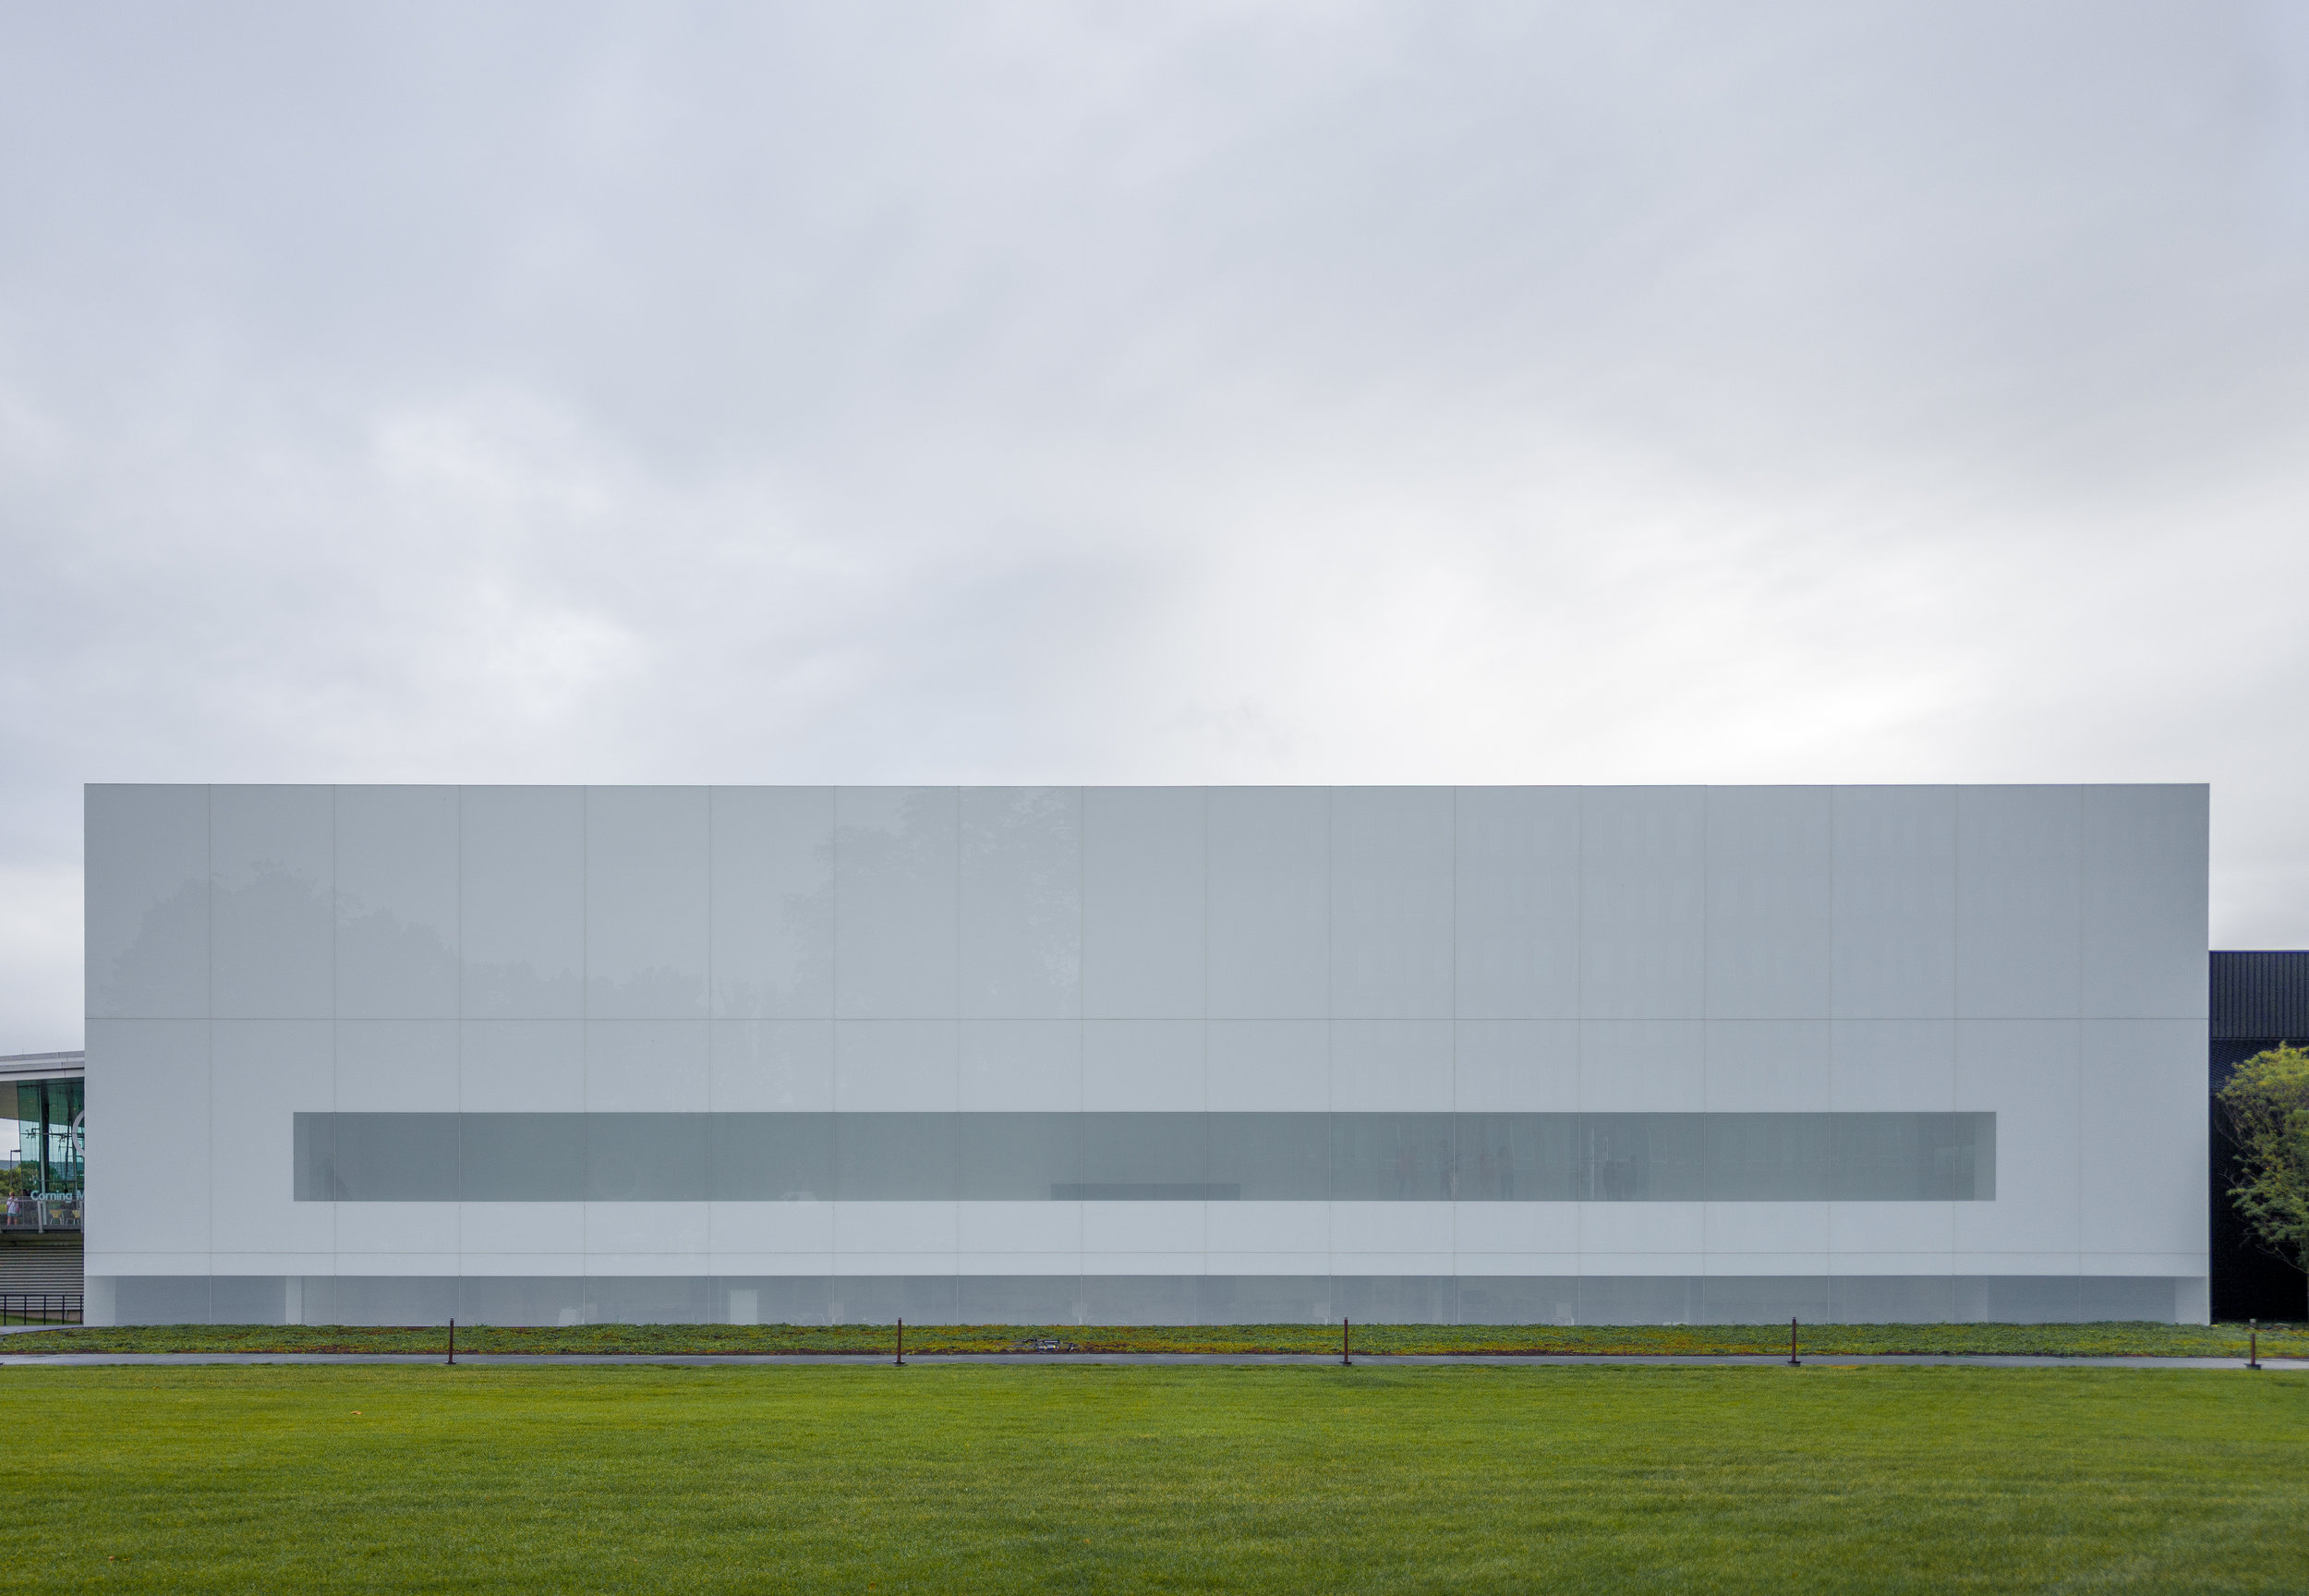 ramsey bakhoum - architectural photographer - corning museum (1 of 1)-7.jpg